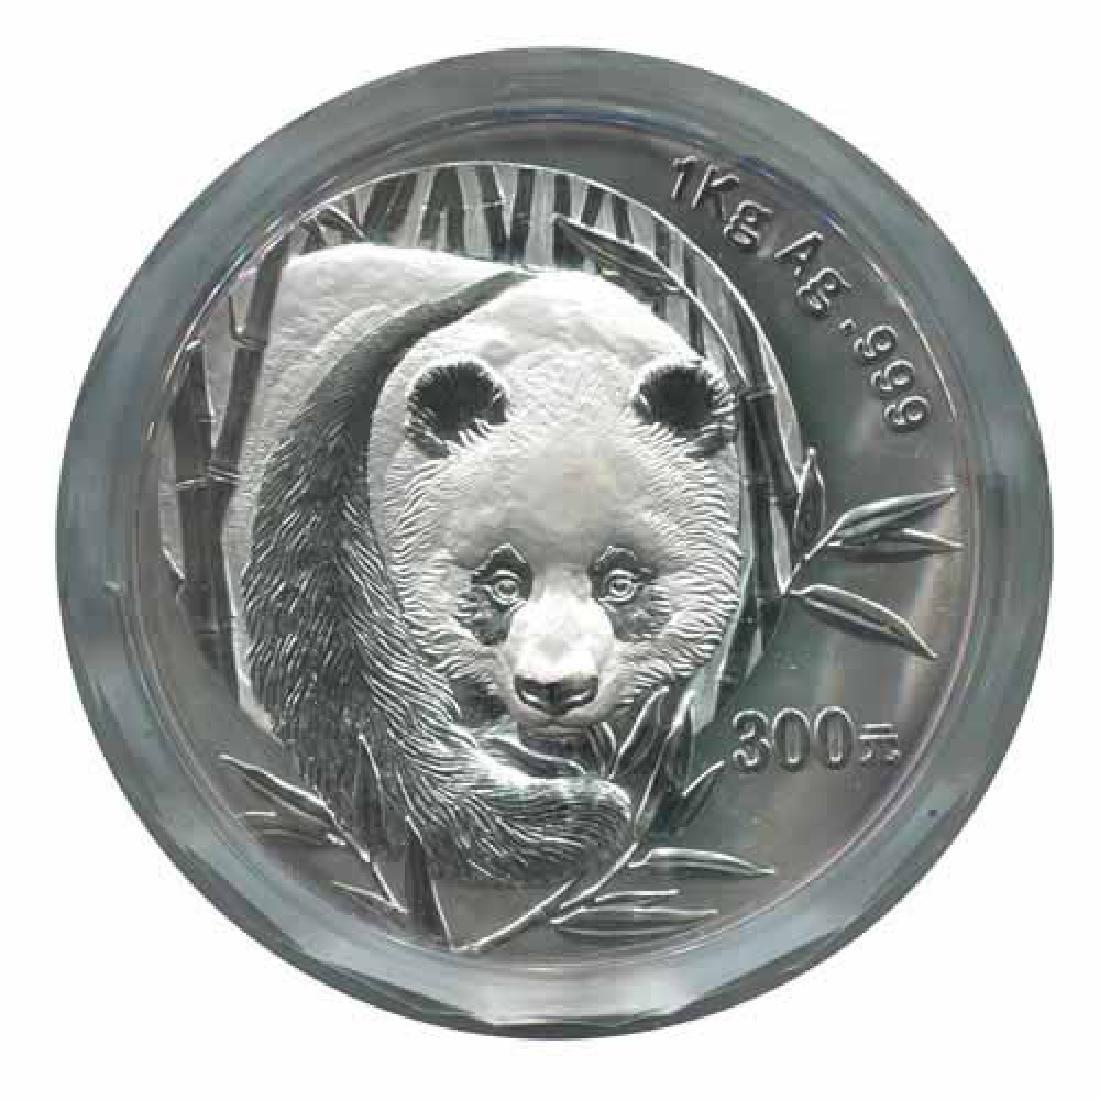 Chinese Silver Panda 2003 1 Kilo